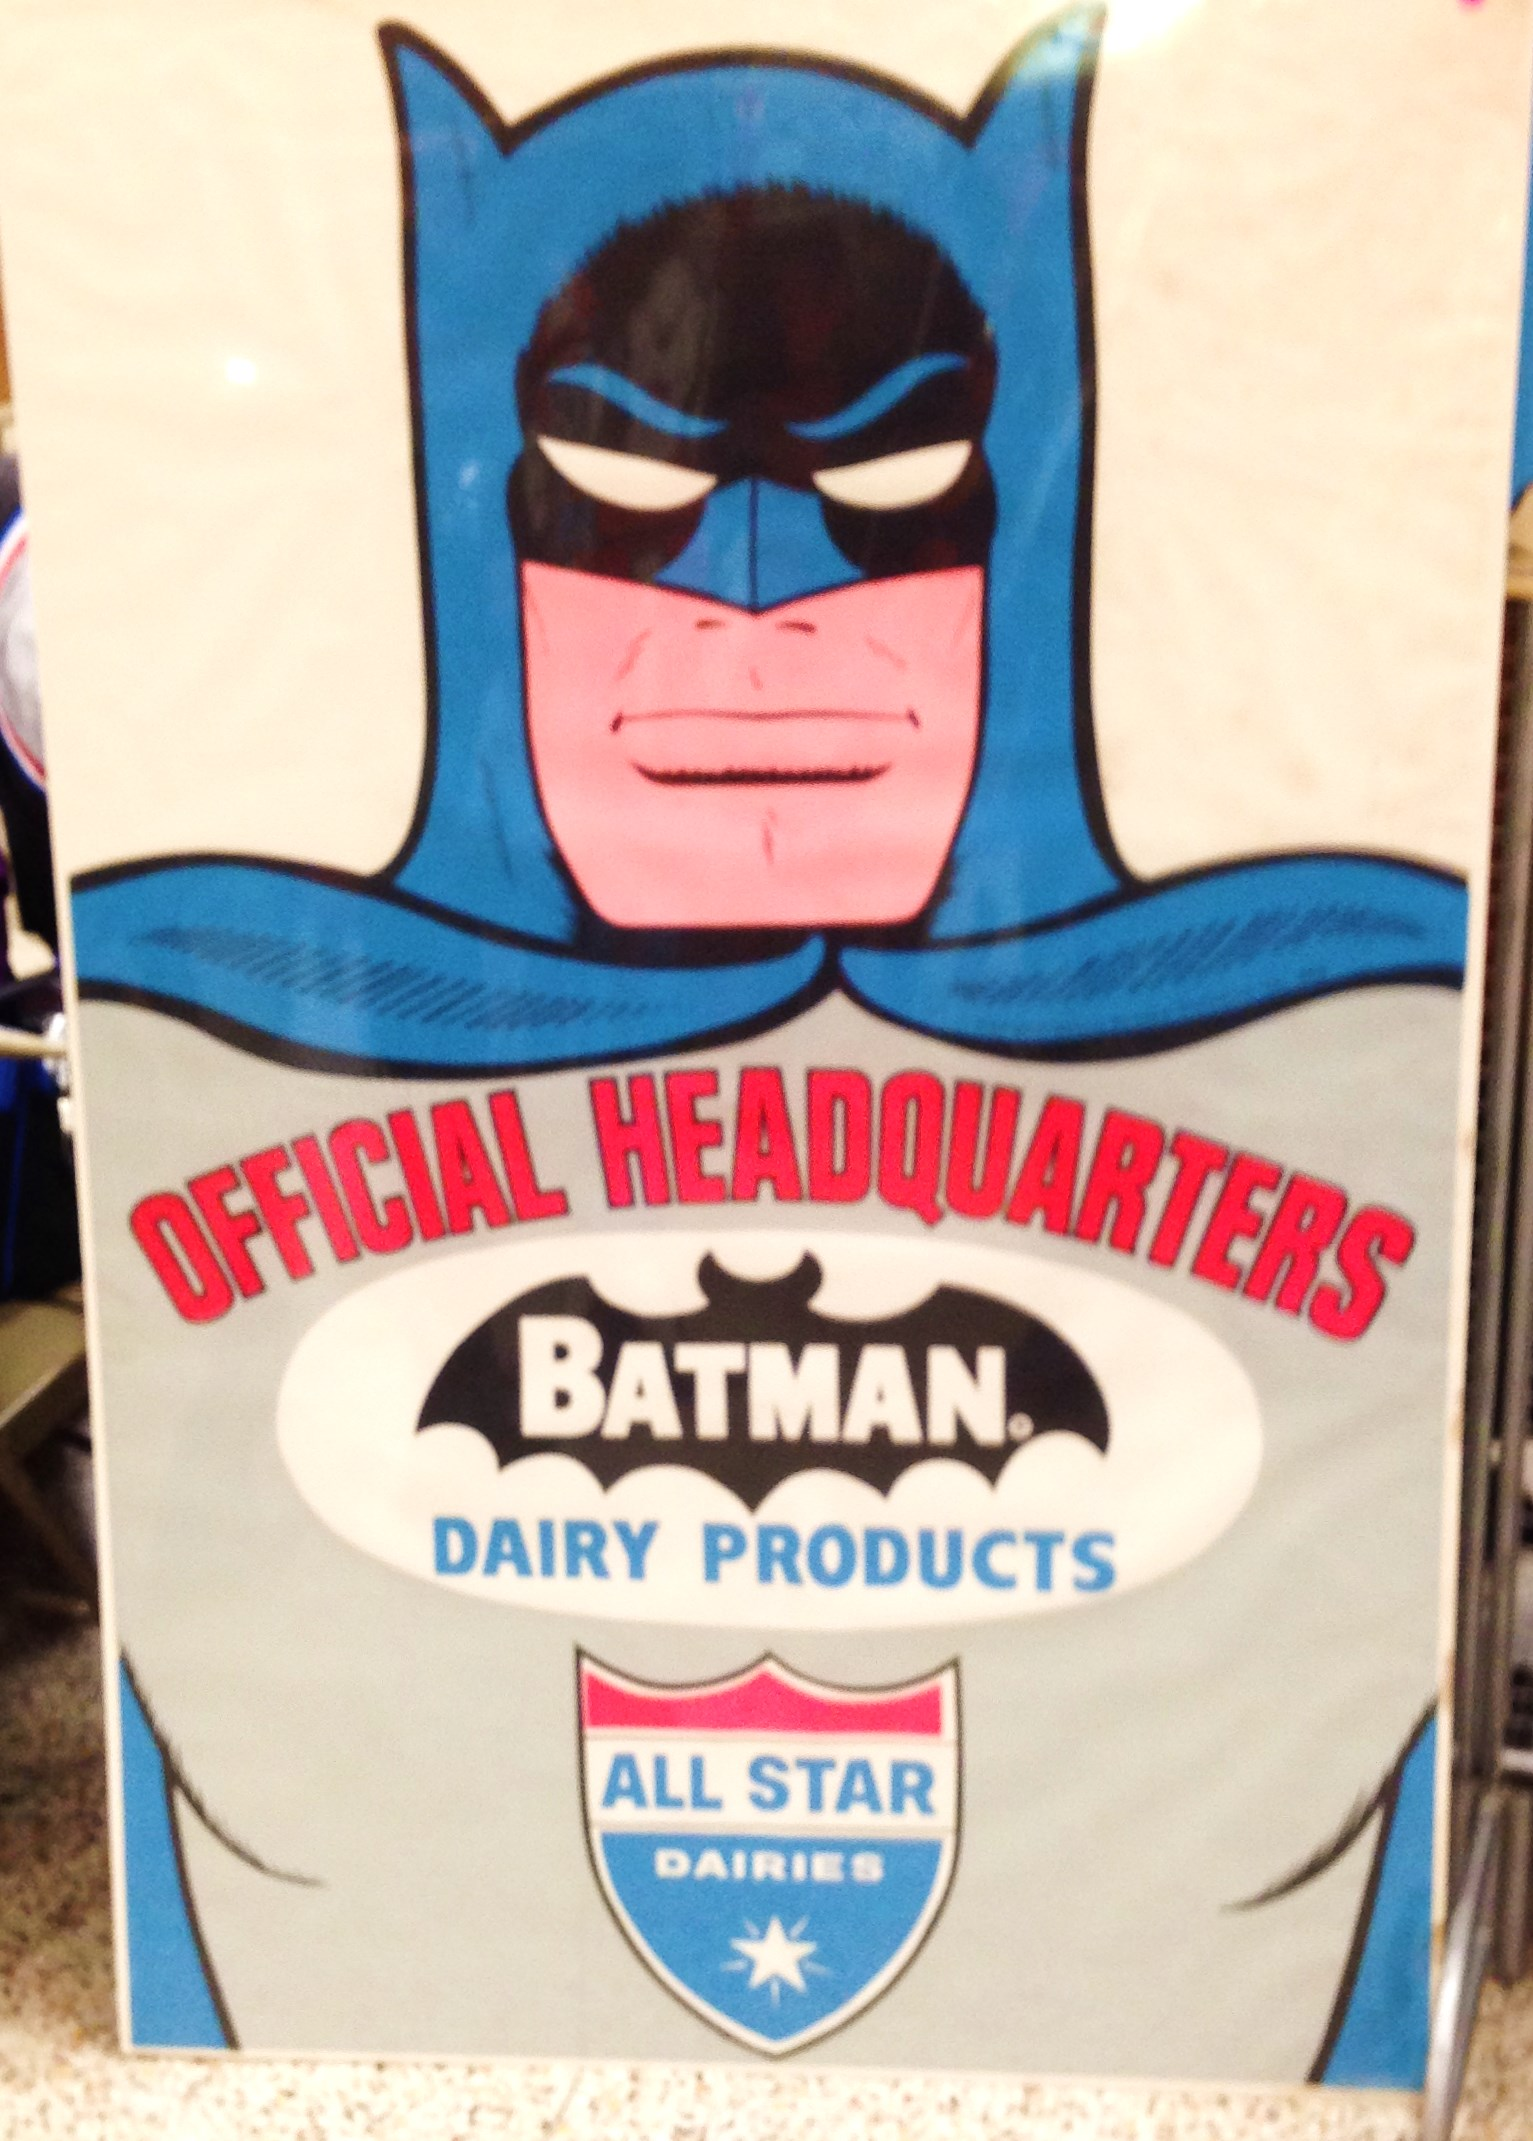 batman comic toy poster photo dairy promo